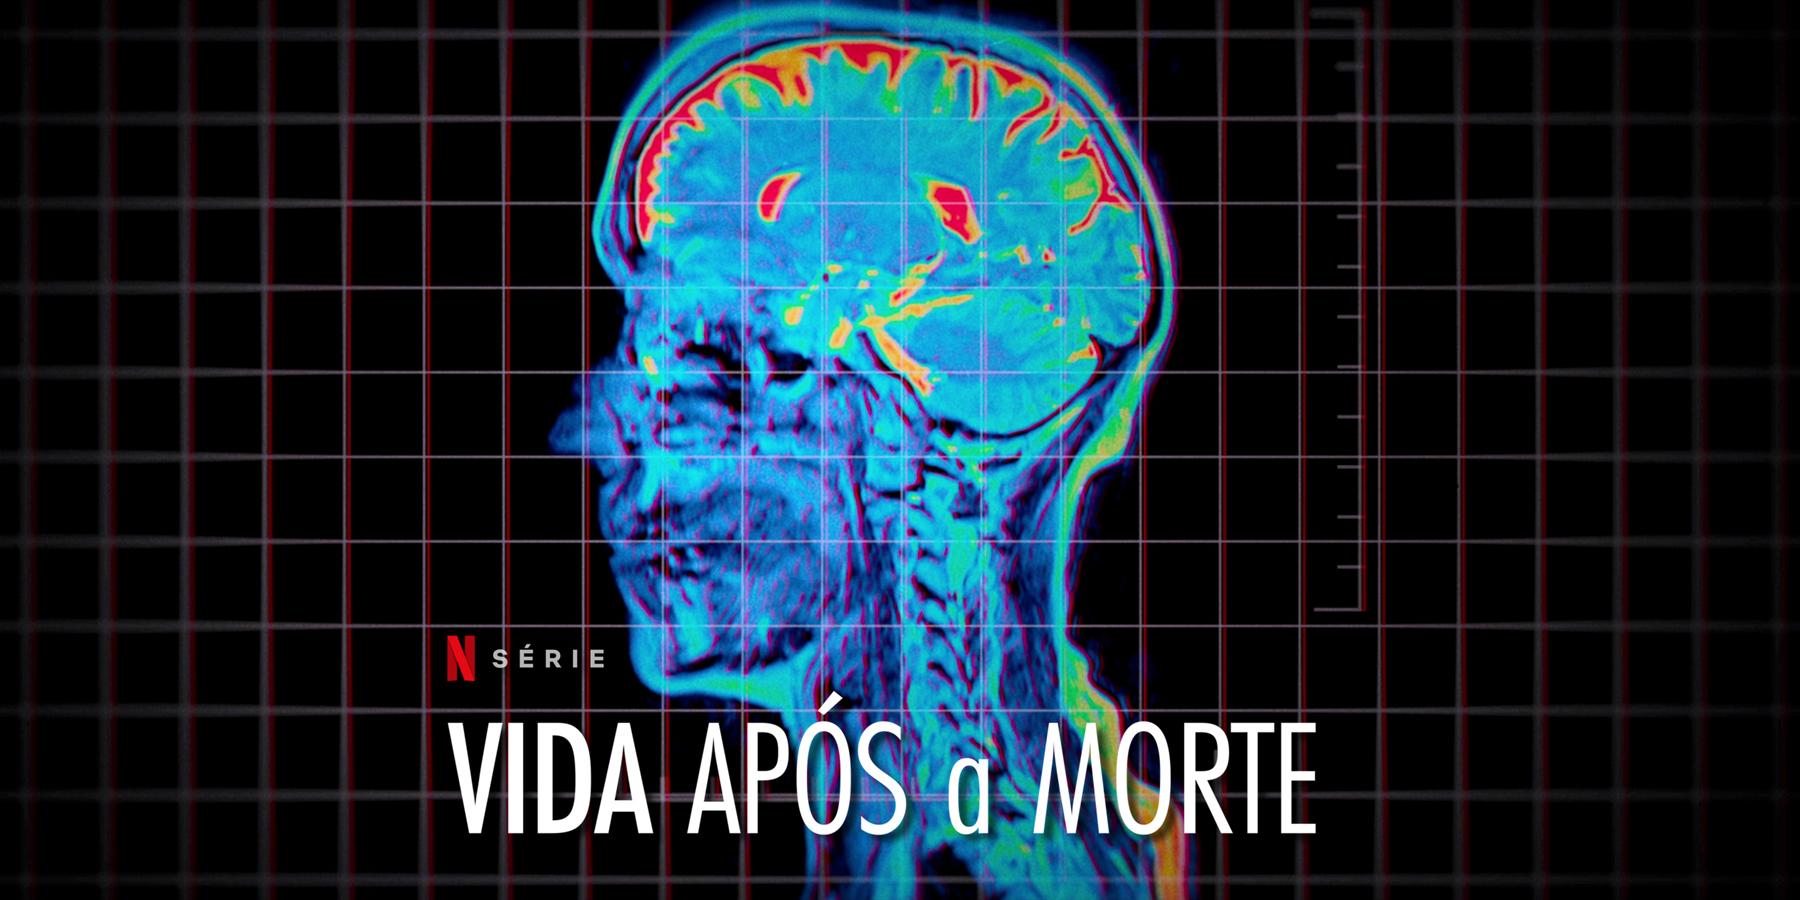 vida-apos-a-morte-surviving-death-netflix-series